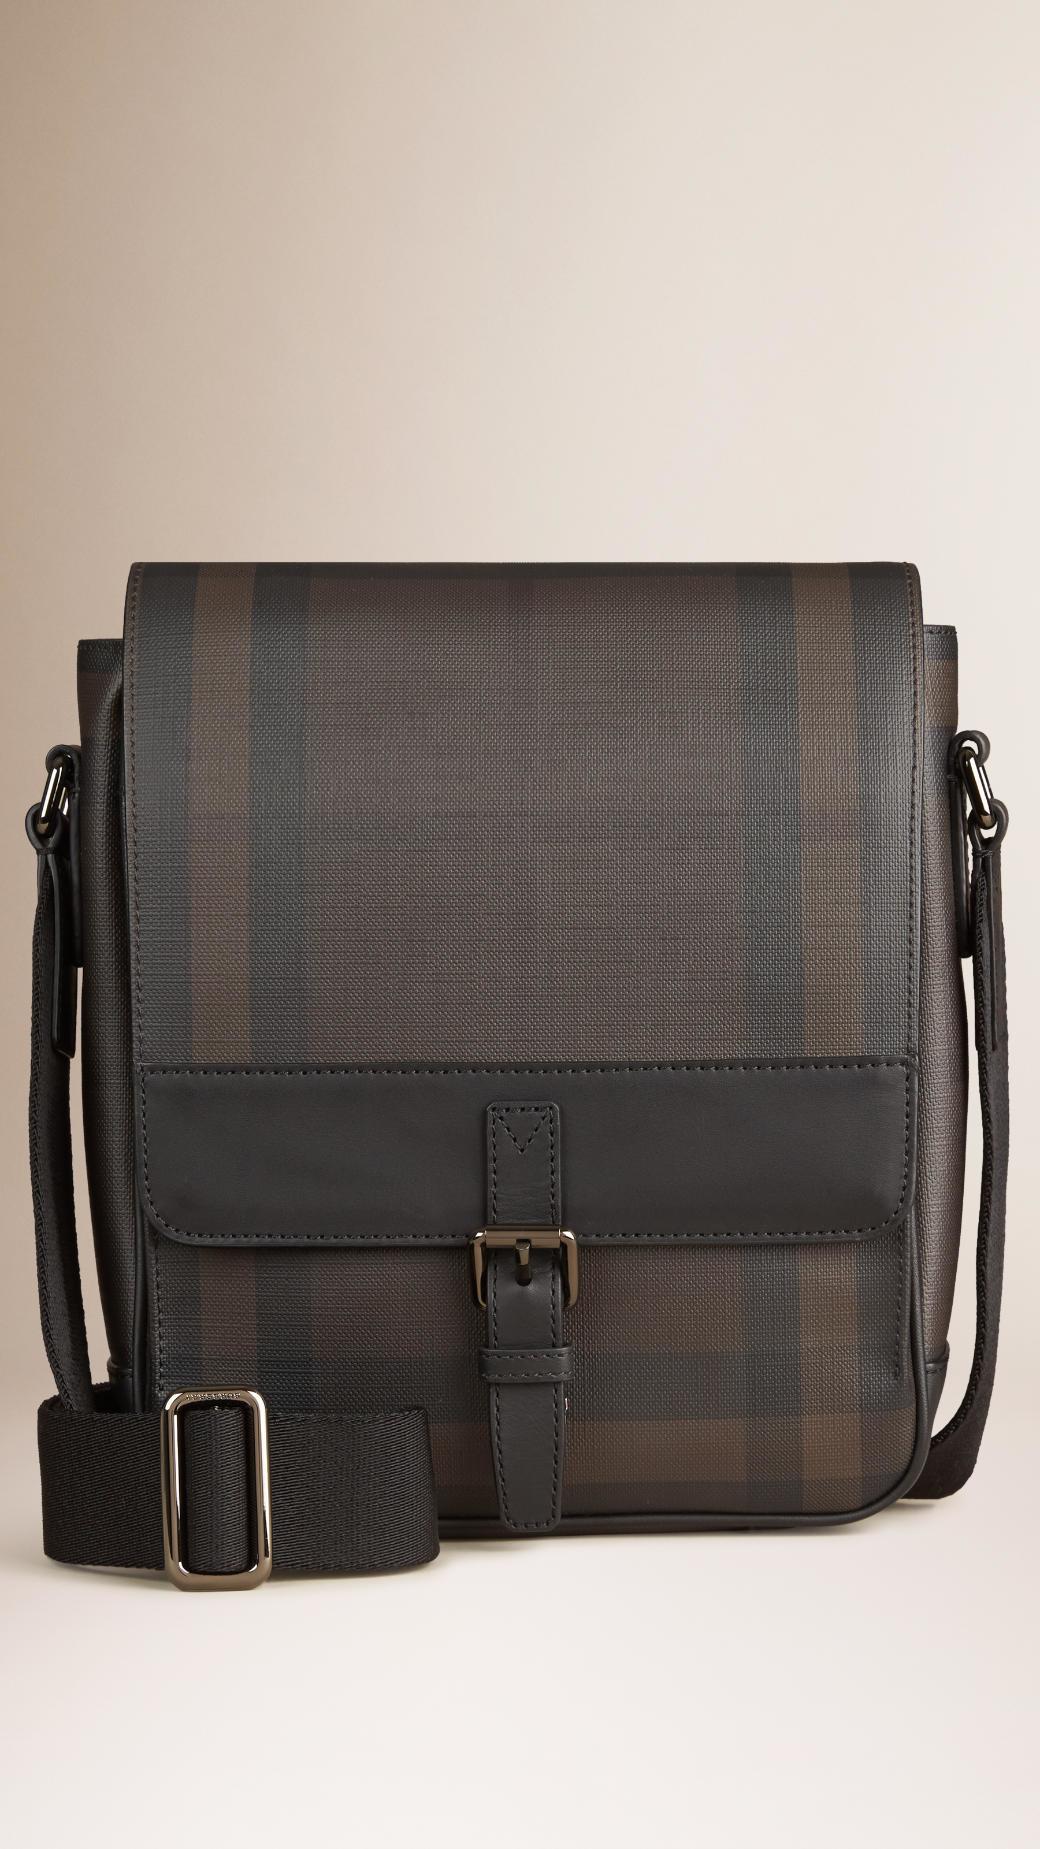 b14df5b17 Burberry Smoked Check Crossbody Bag in Black for Men - Lyst